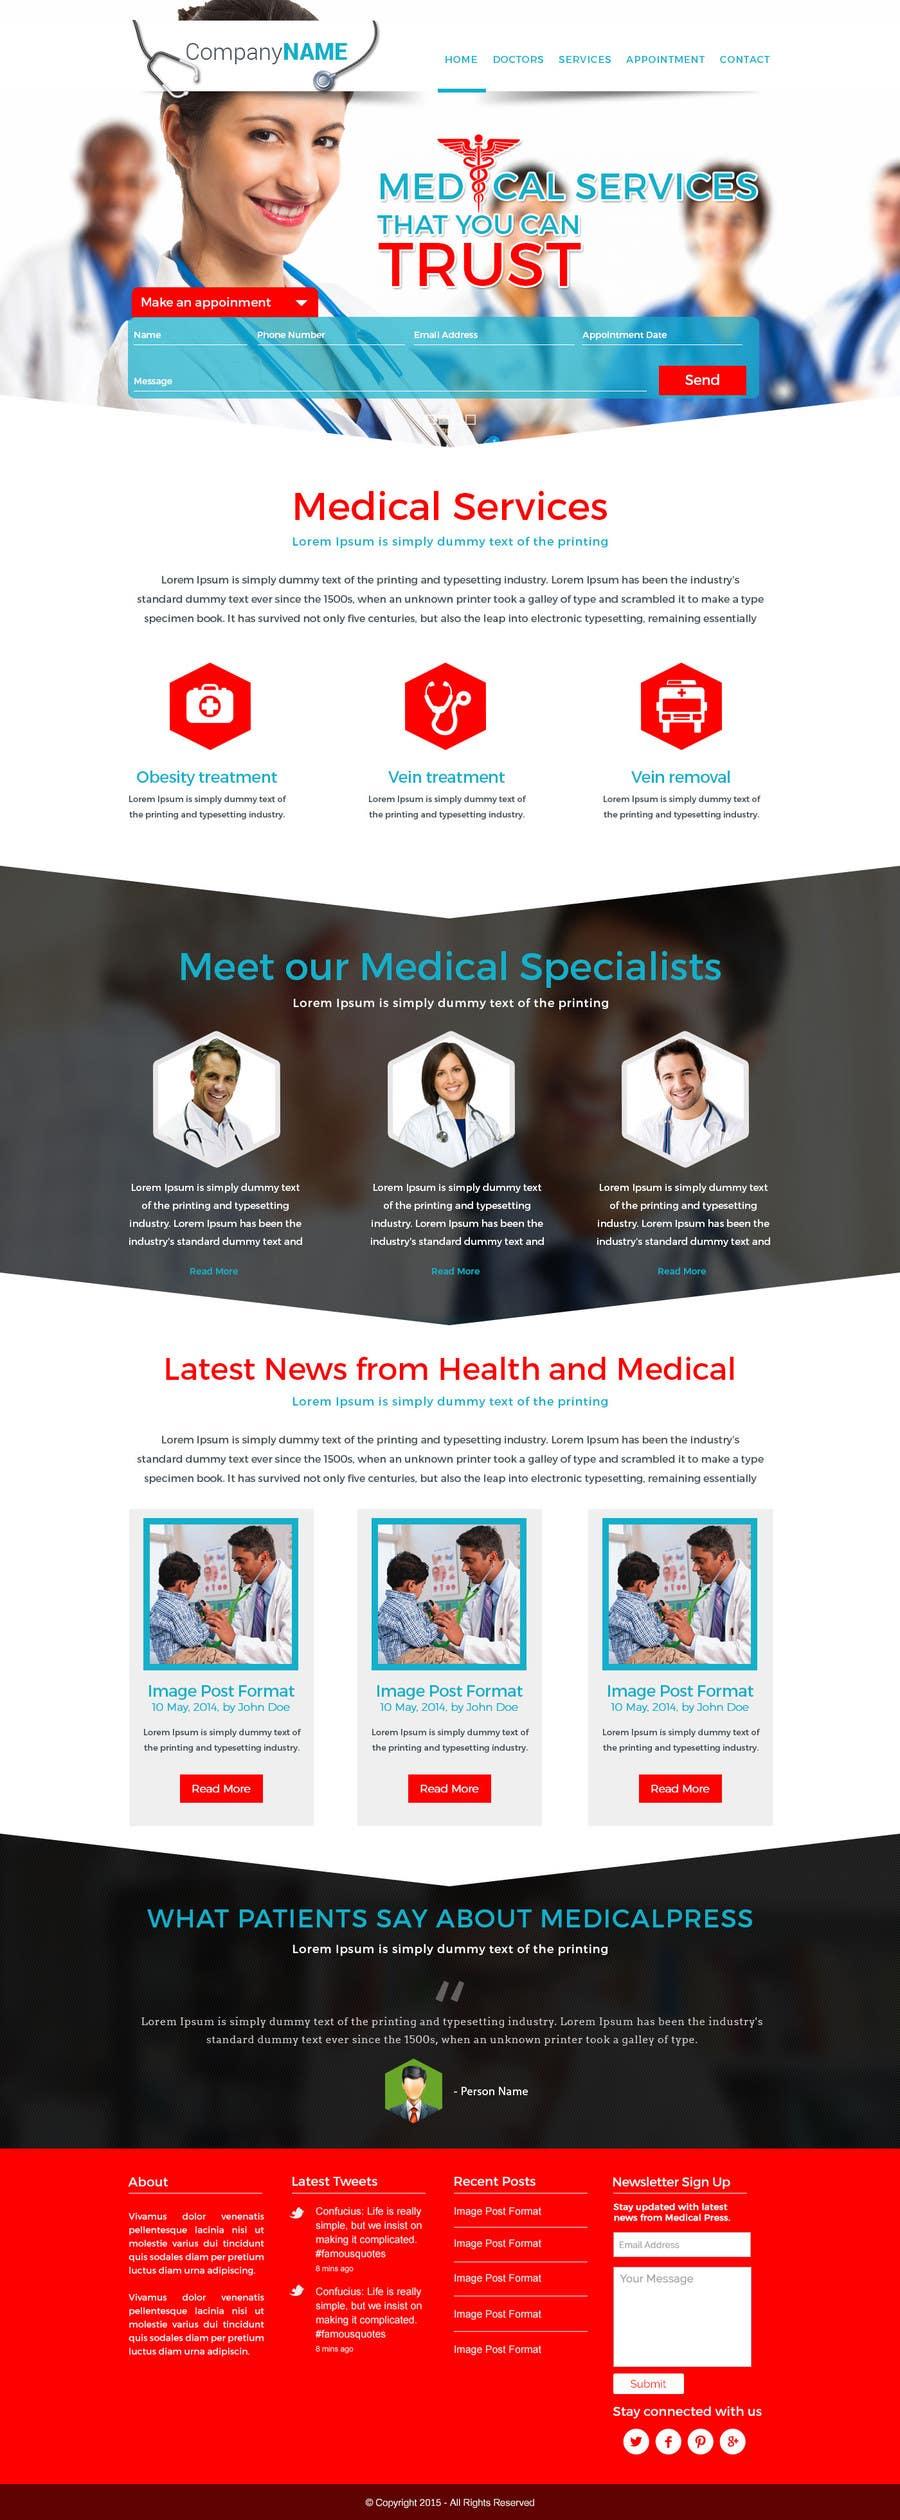 Bài tham dự cuộc thi #11 cho Design a Website Mockup for a surgeon